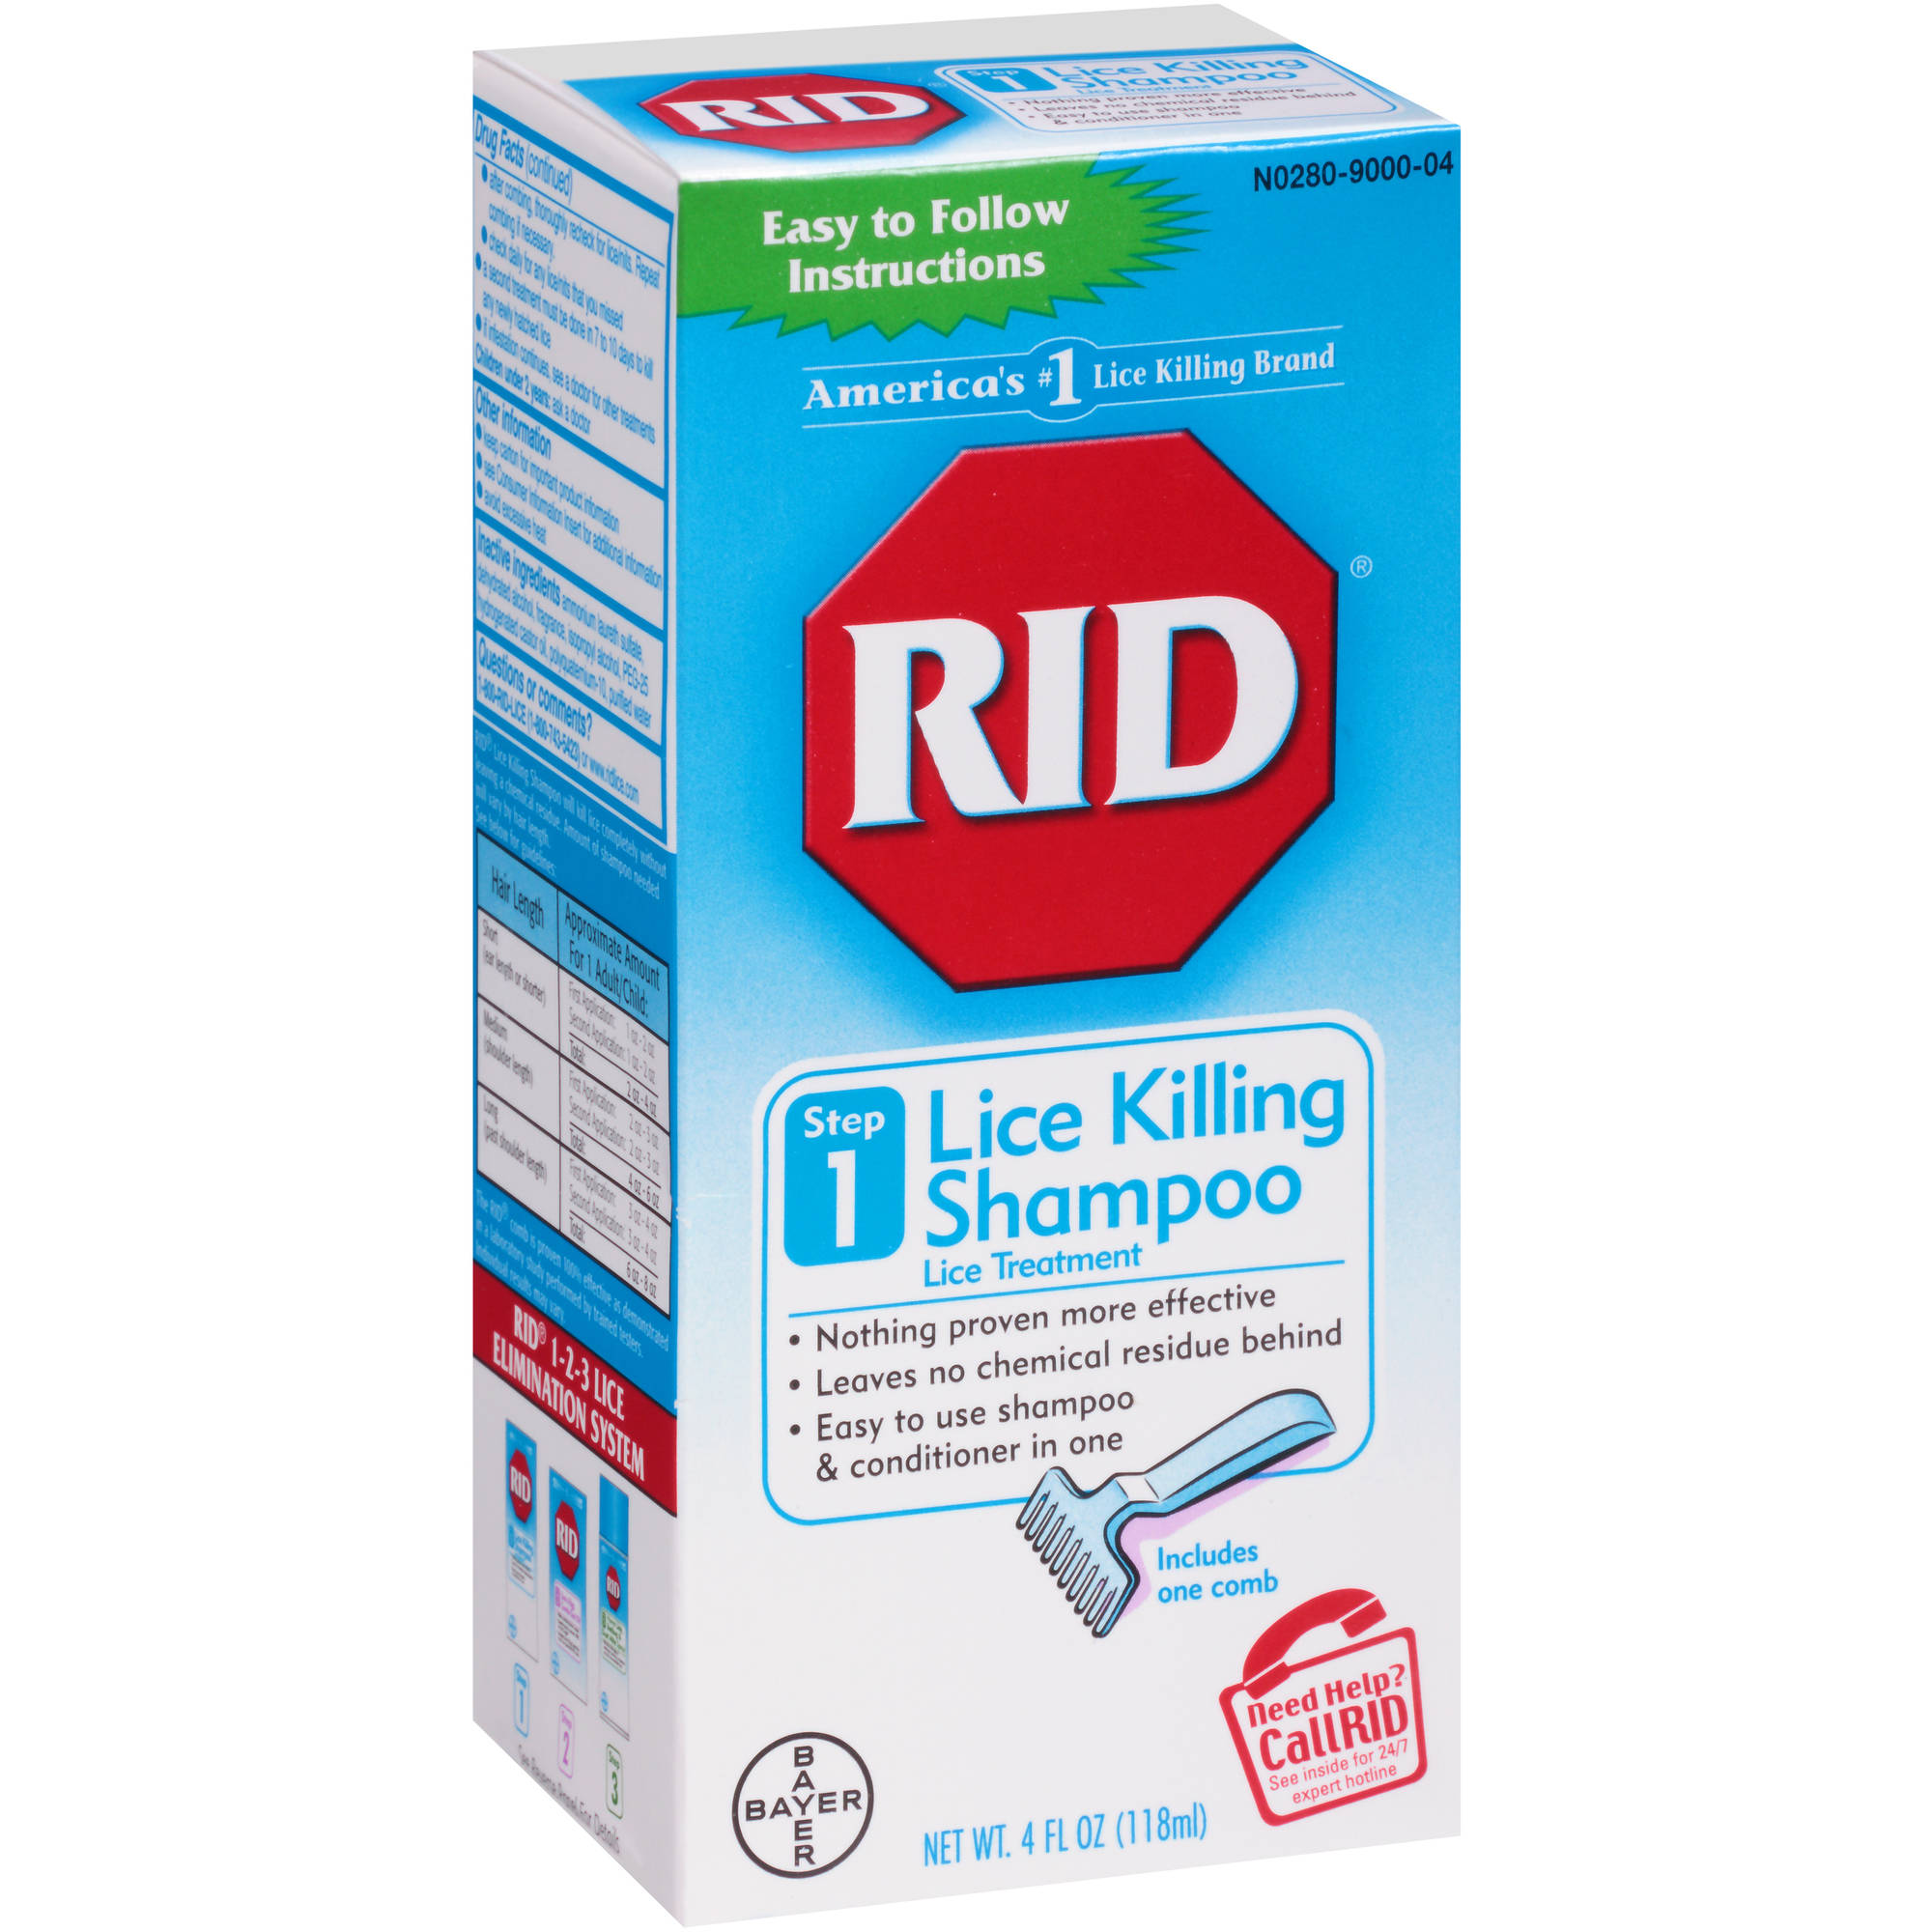 RID Lice Killing Shampoo, 4 fl oz